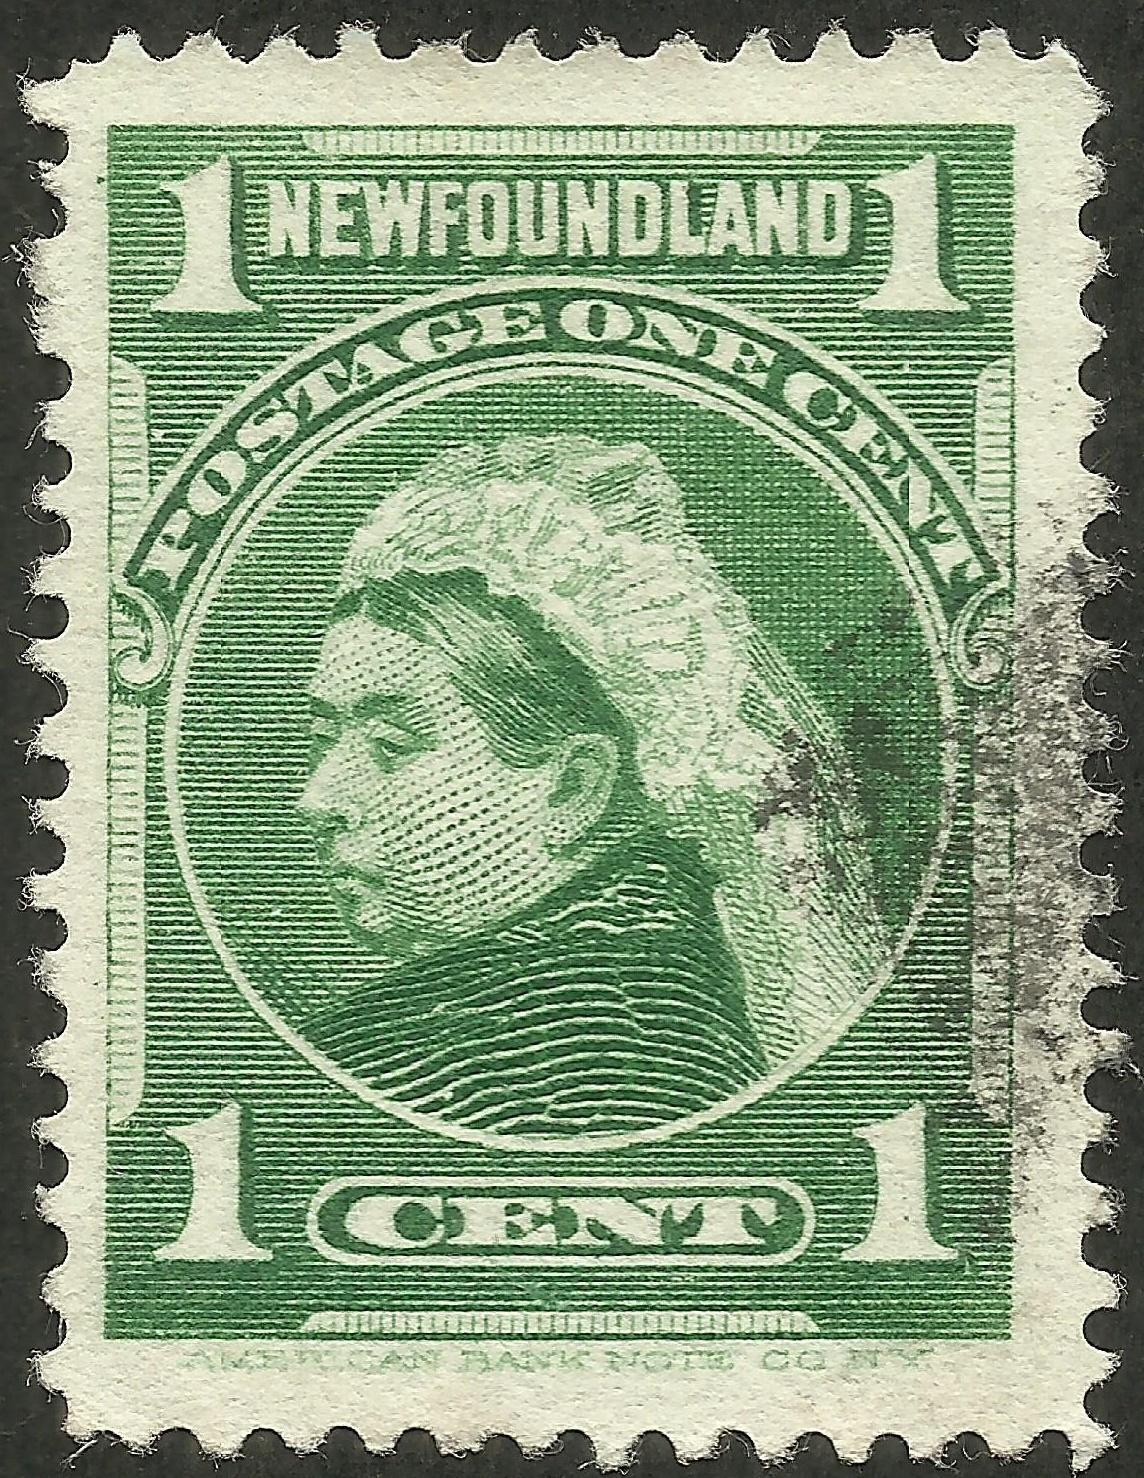 Newfoundland - Scott #80 (1898)